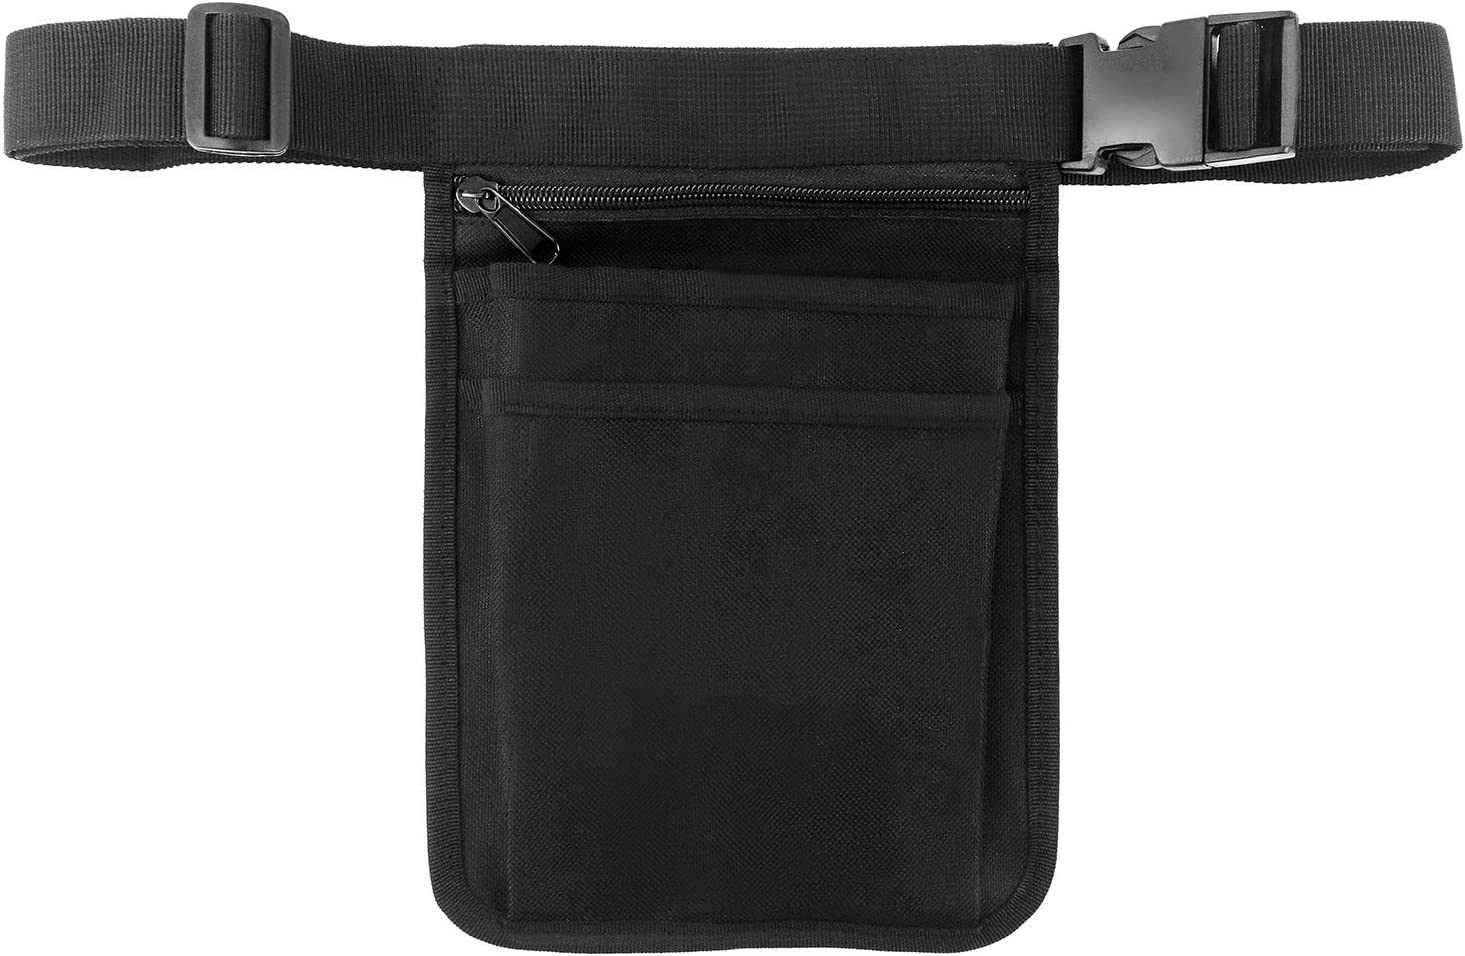 QWORK Medical Organizer Belt Genuine Free Shipping Nurse Waist Storage Pouch Bag sold out